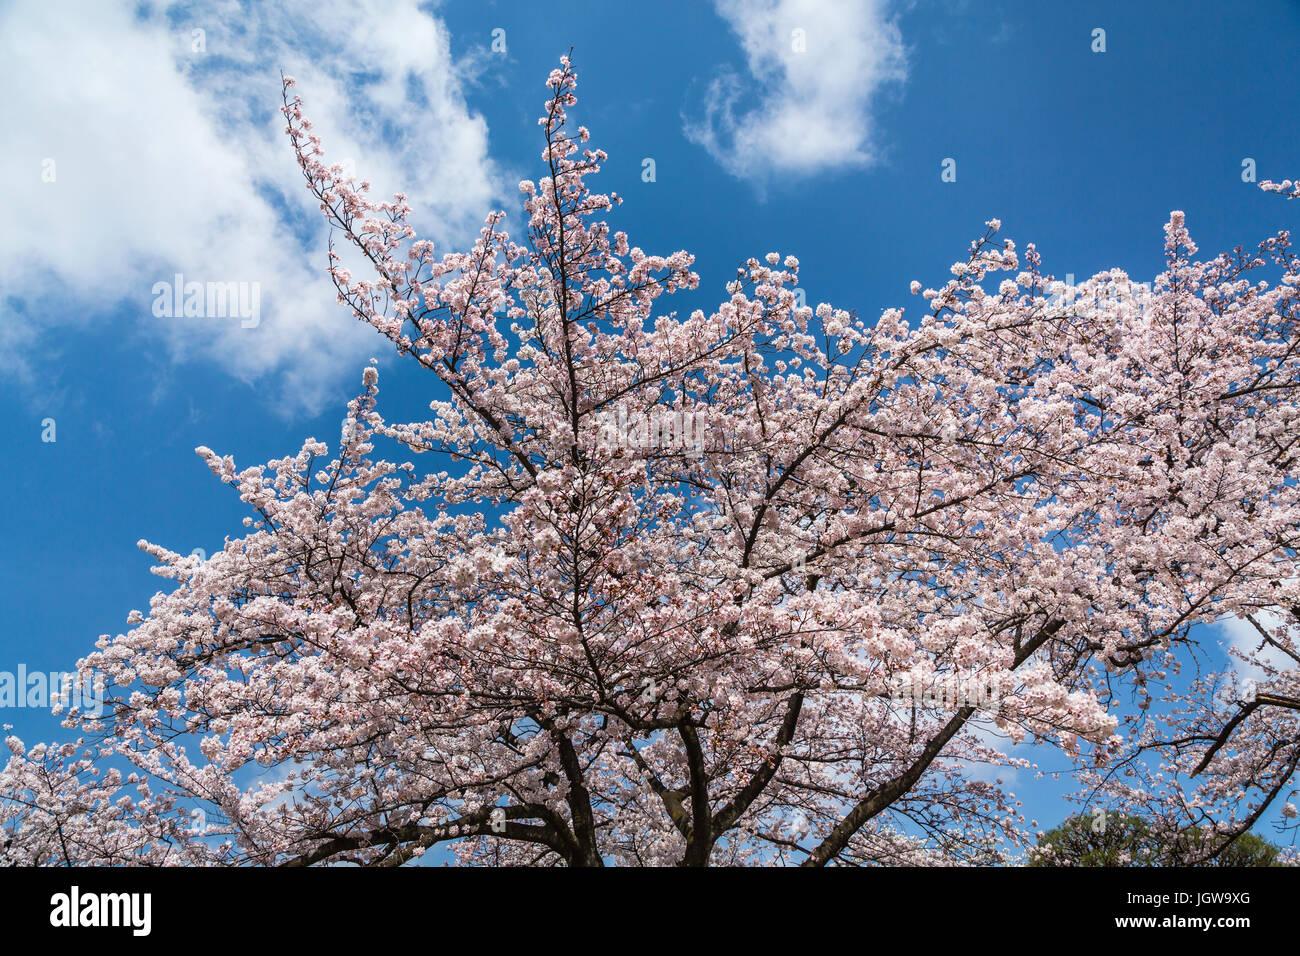 Sakura Fleurs De Cerisier Dans Le Jardin National De Shinjuku Gyoen